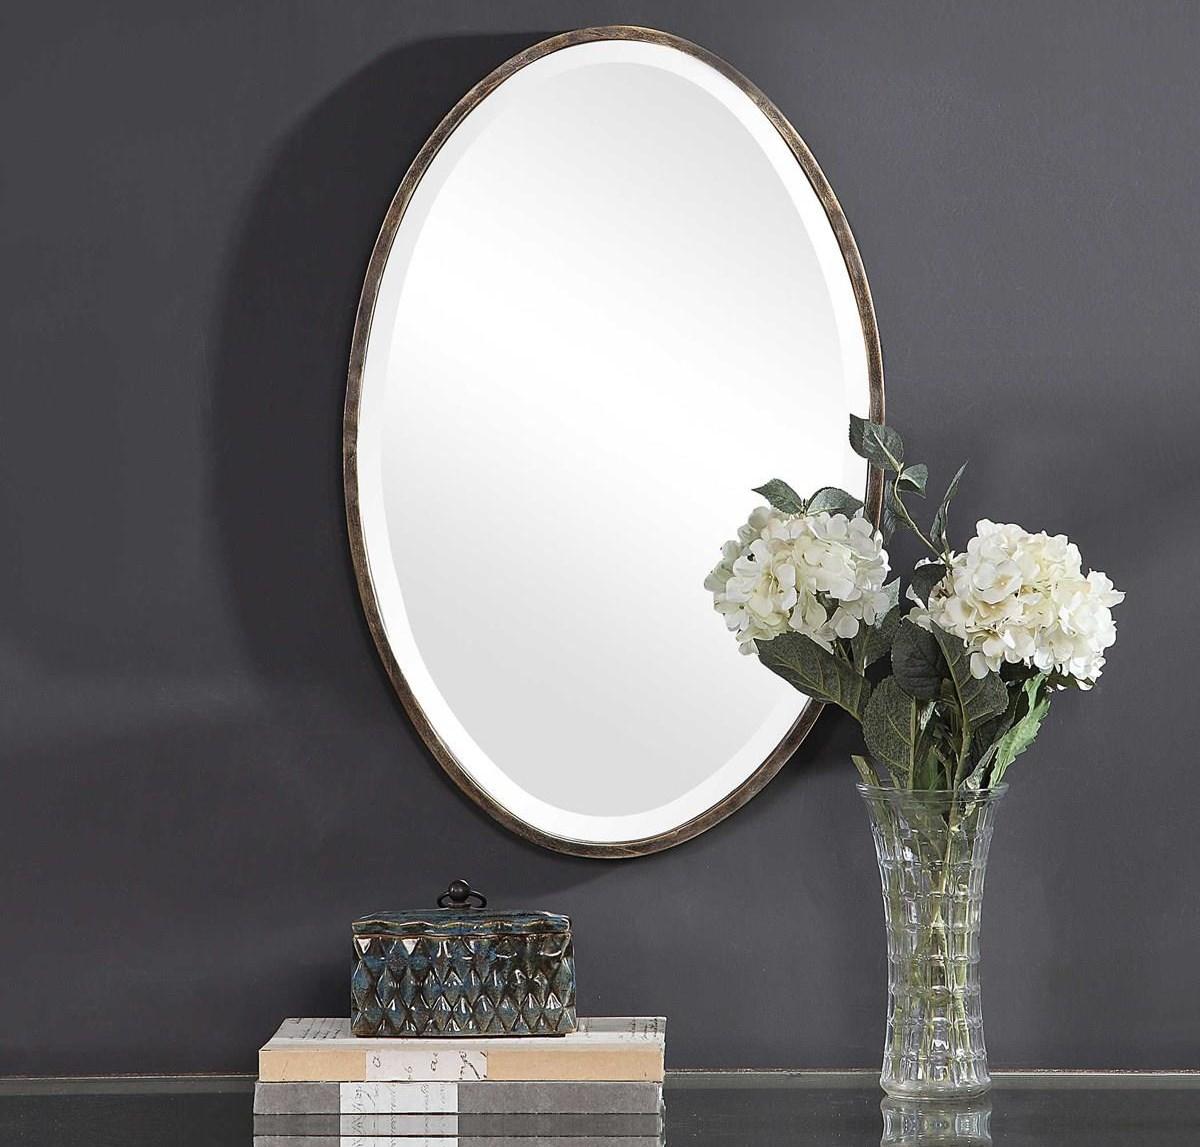 Mirrors AUBREY WALL MIRROR by Unique at Walker's Furniture